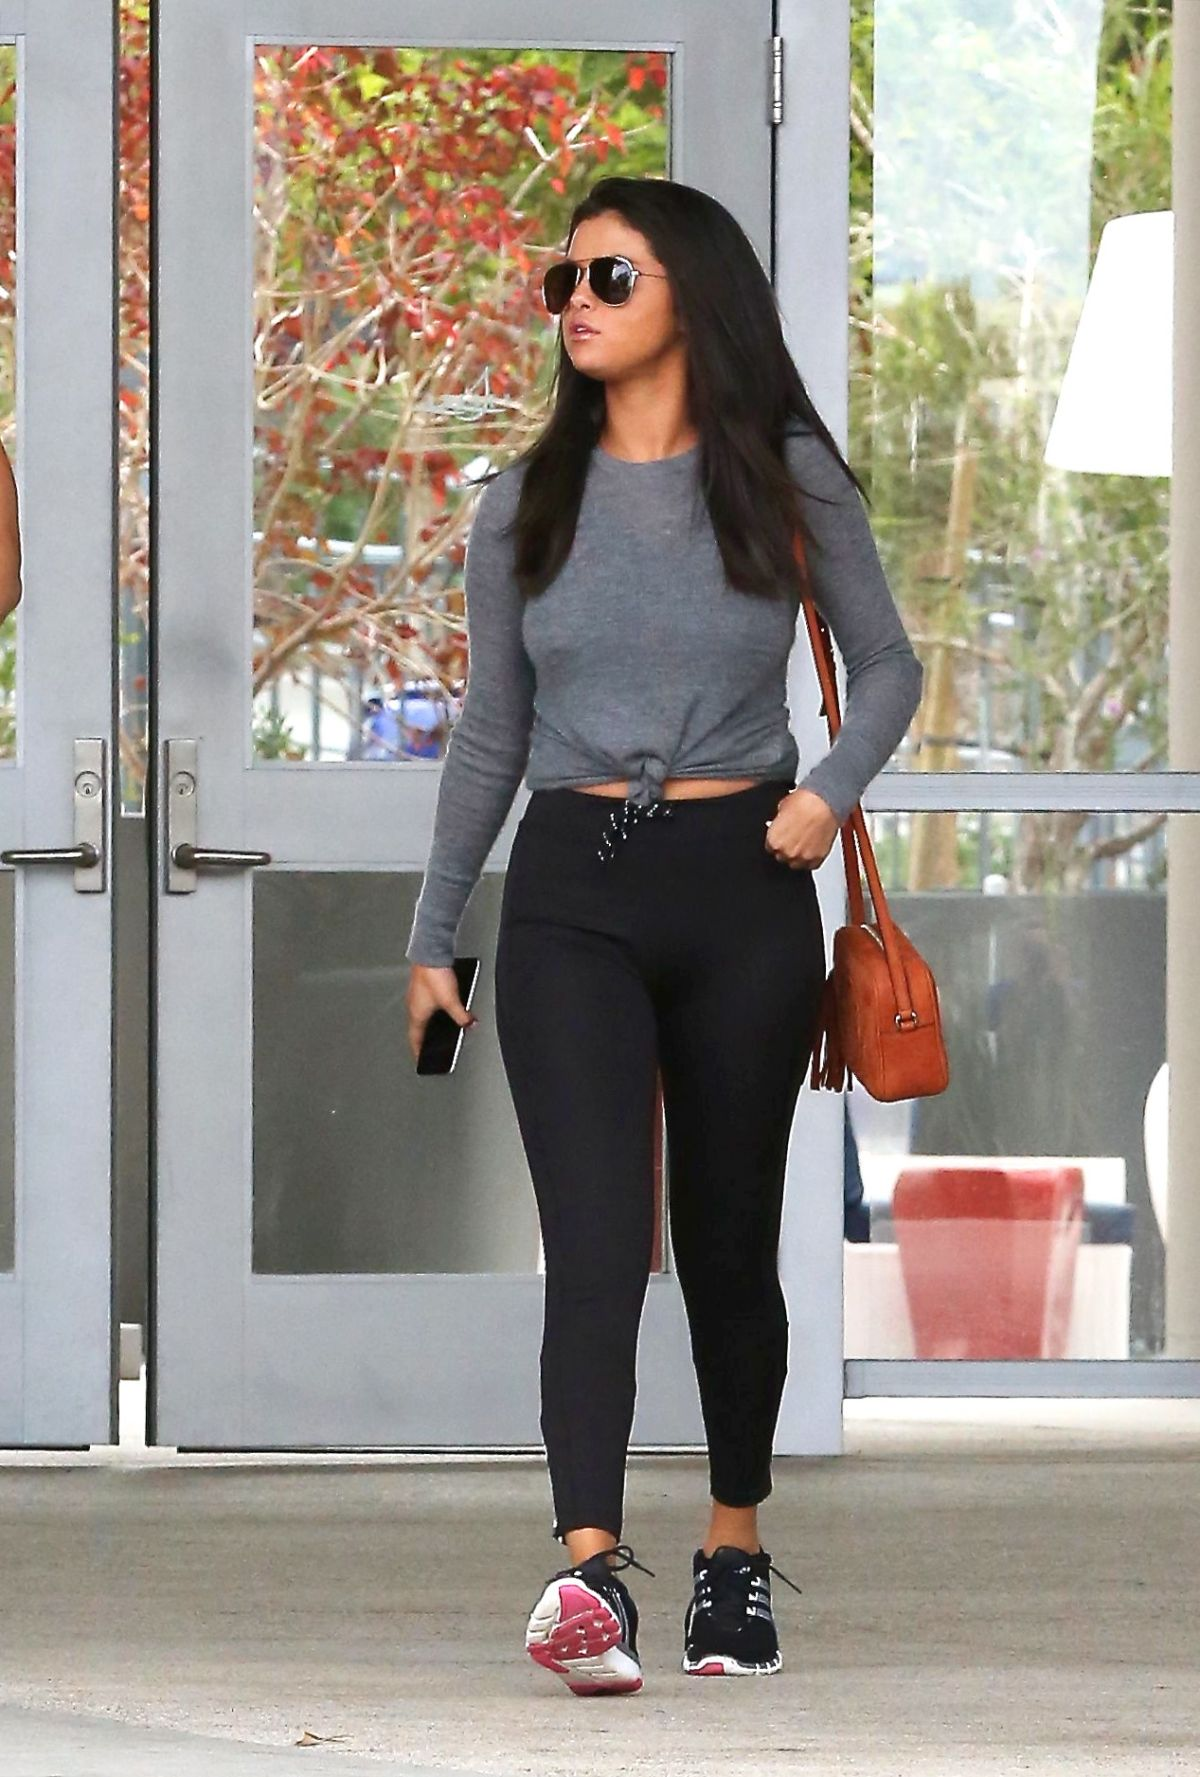 SELENA GOMEZ Leaves a Gym in West Hollywood 06/18/2015 ... Selena Gomez Gym